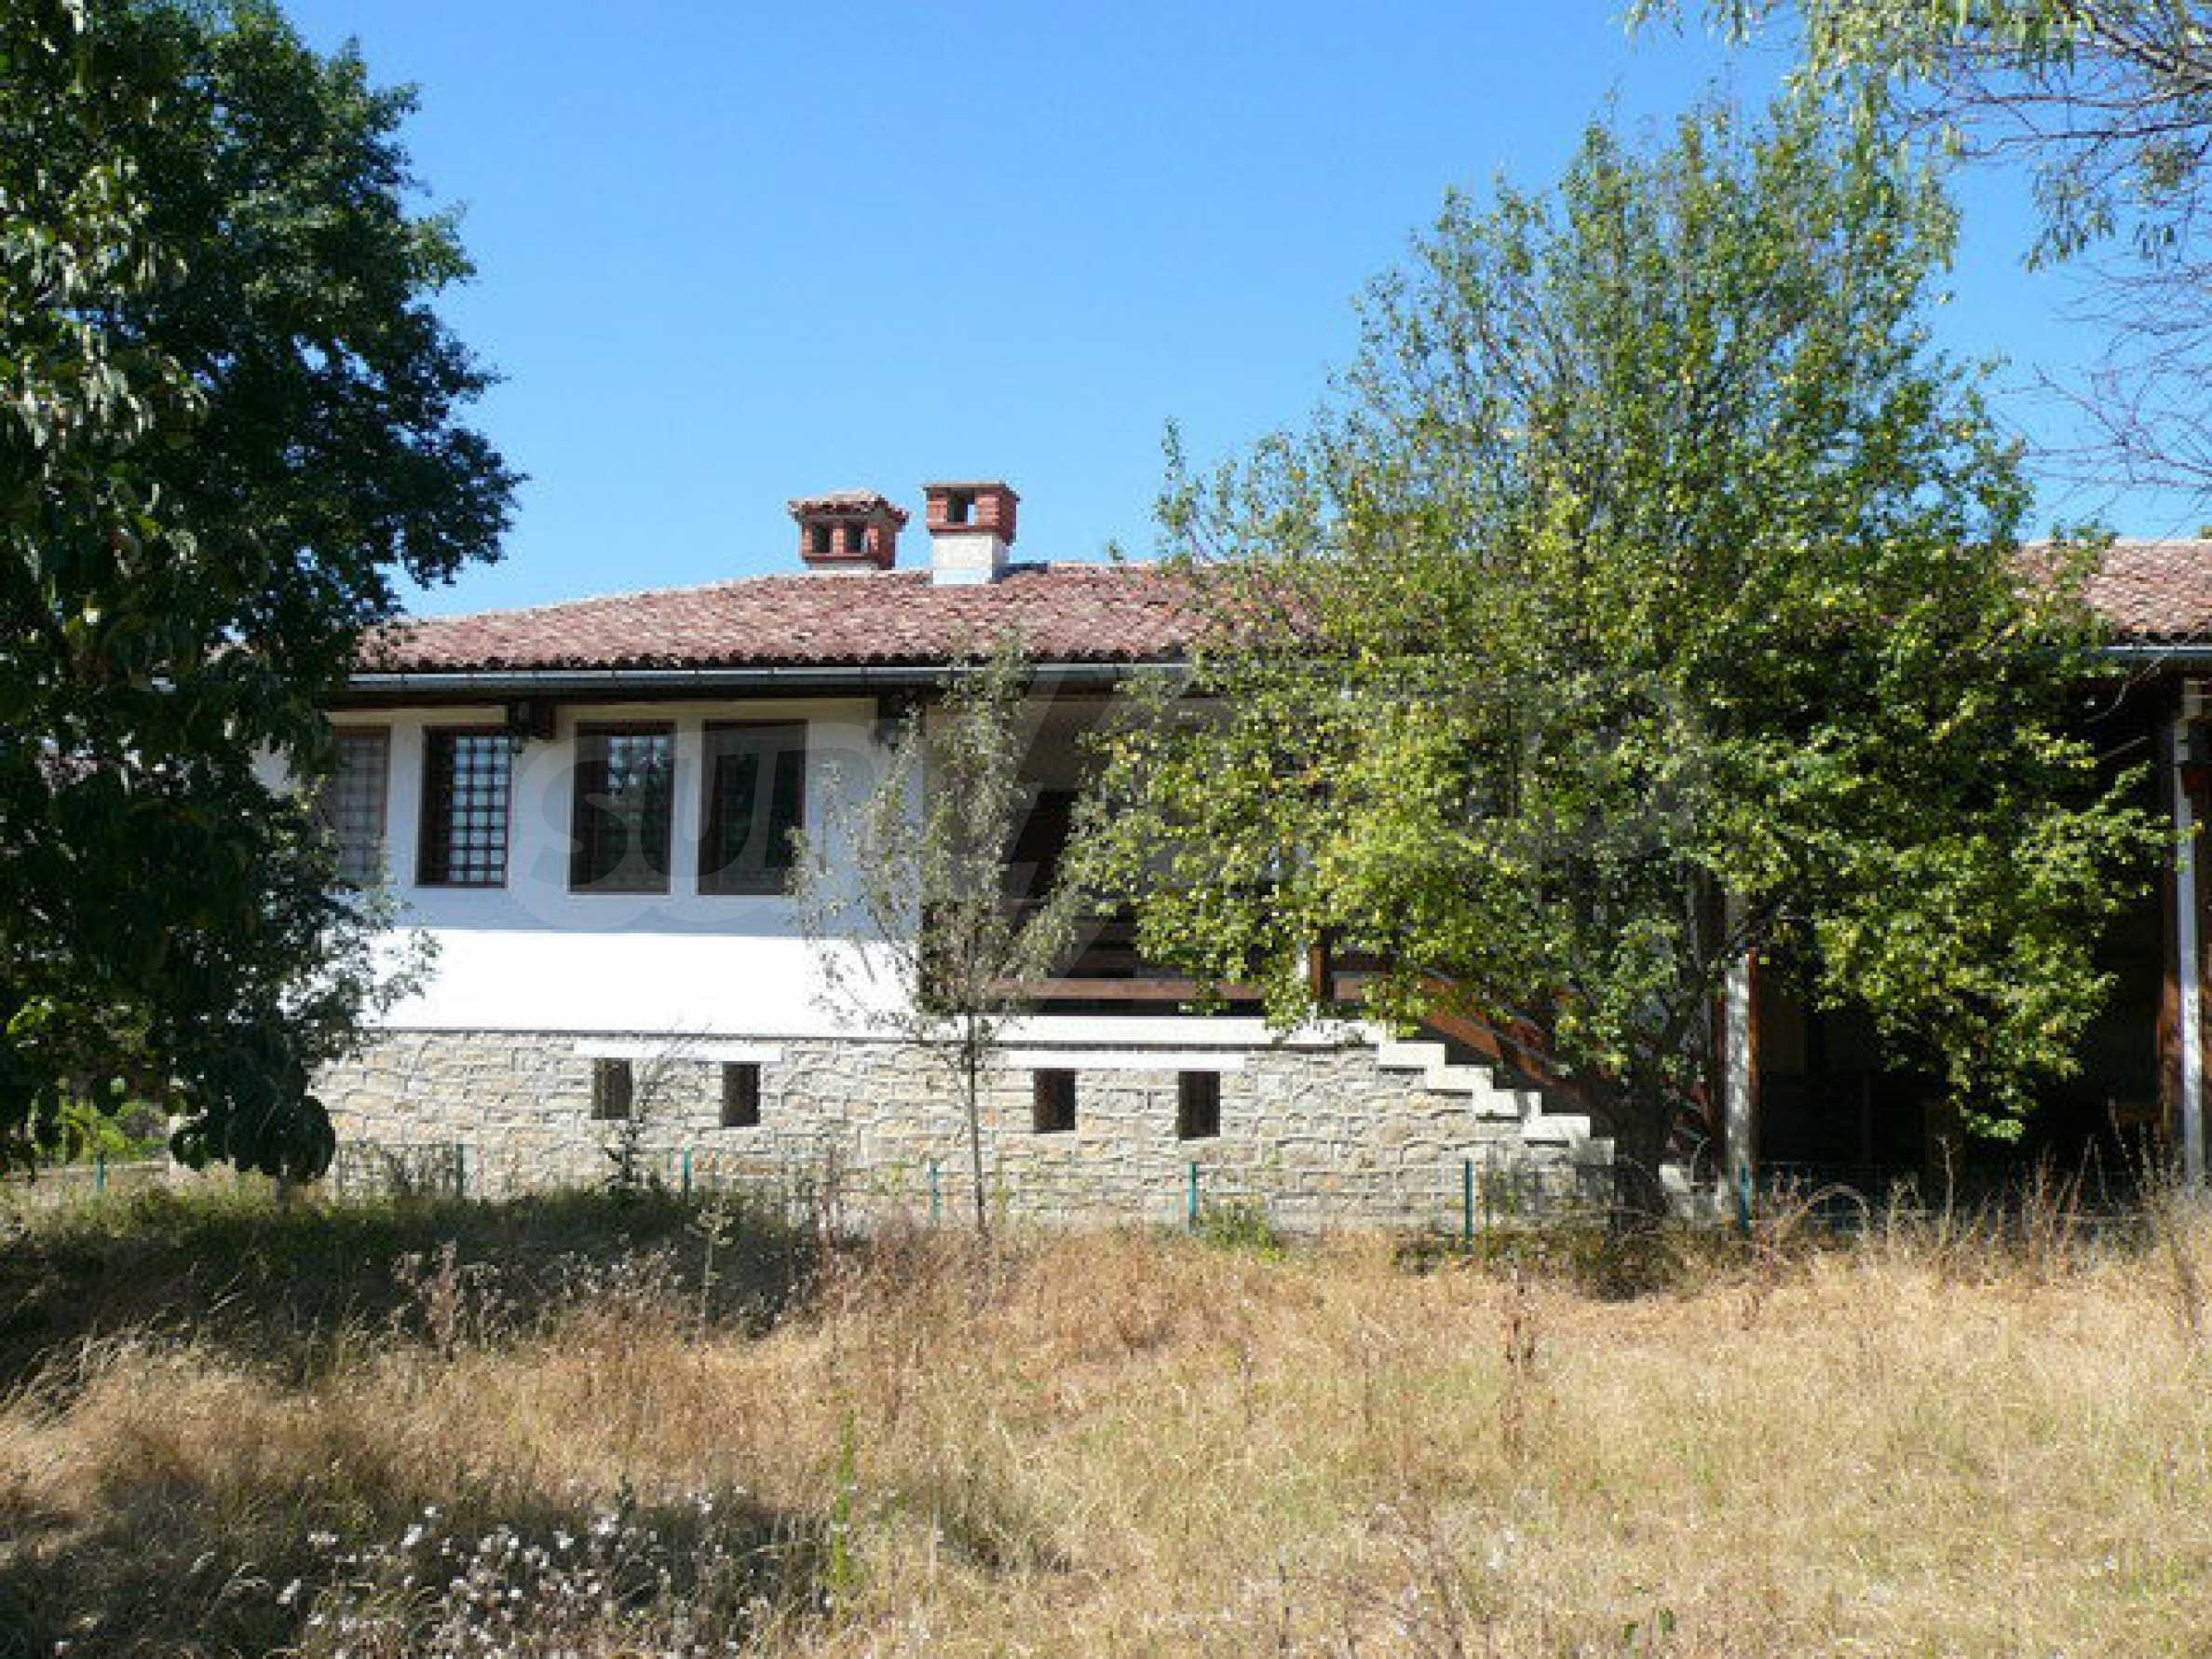 Renoviertes Haus nur 3 km von Veliko Tarnovo entfernt 4